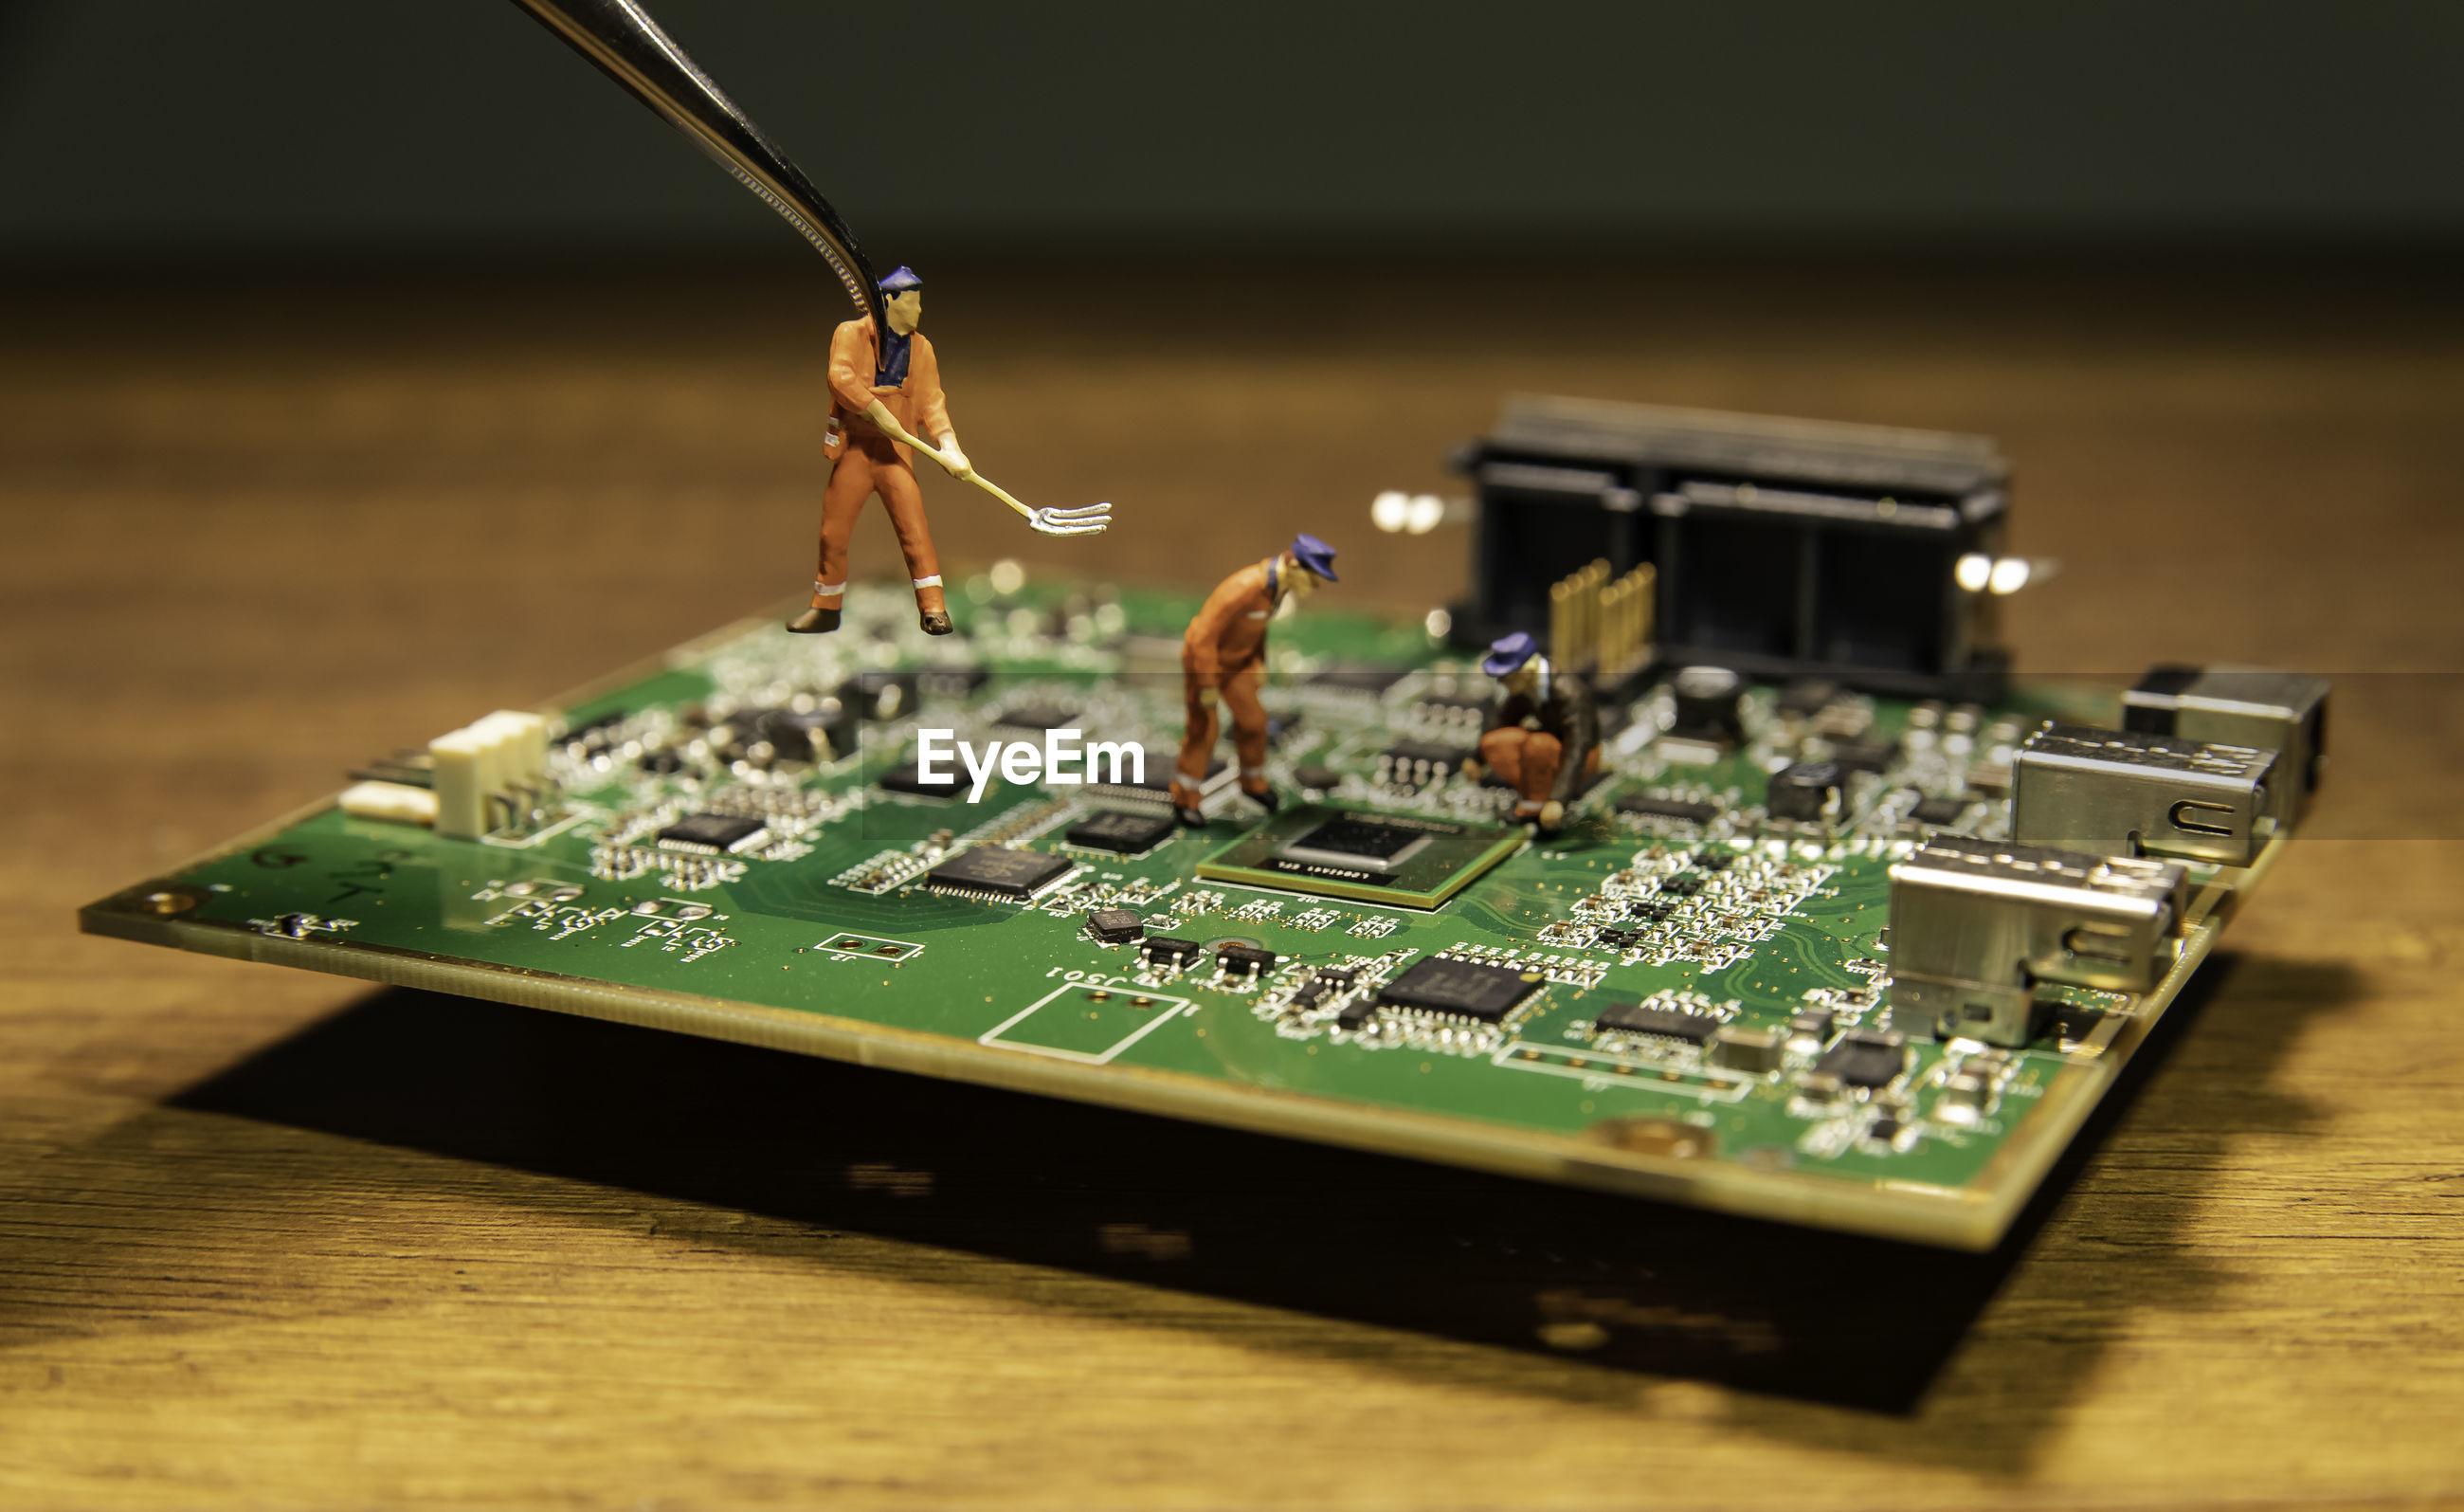 Circuit board on table